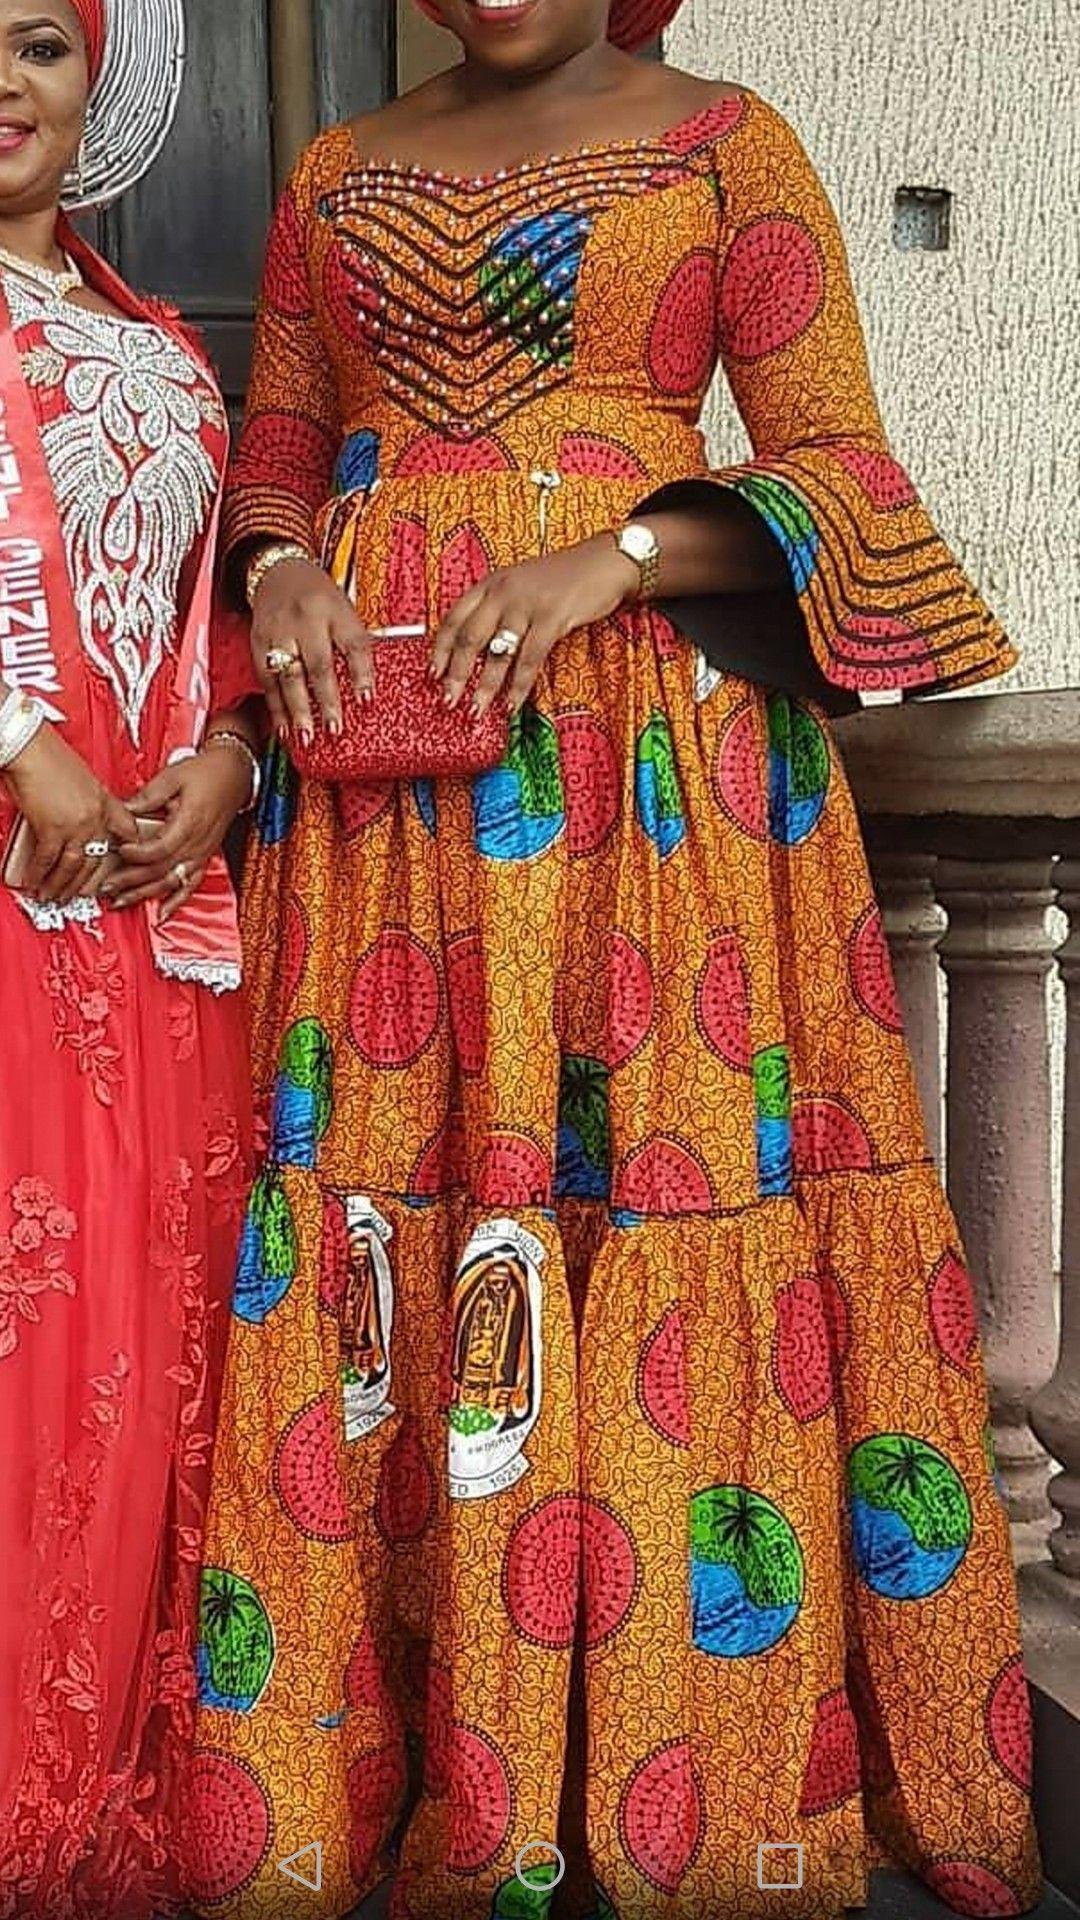 #AfricanPrint | Robe africaine, Mode africaine robe, Mode africaine robe longue